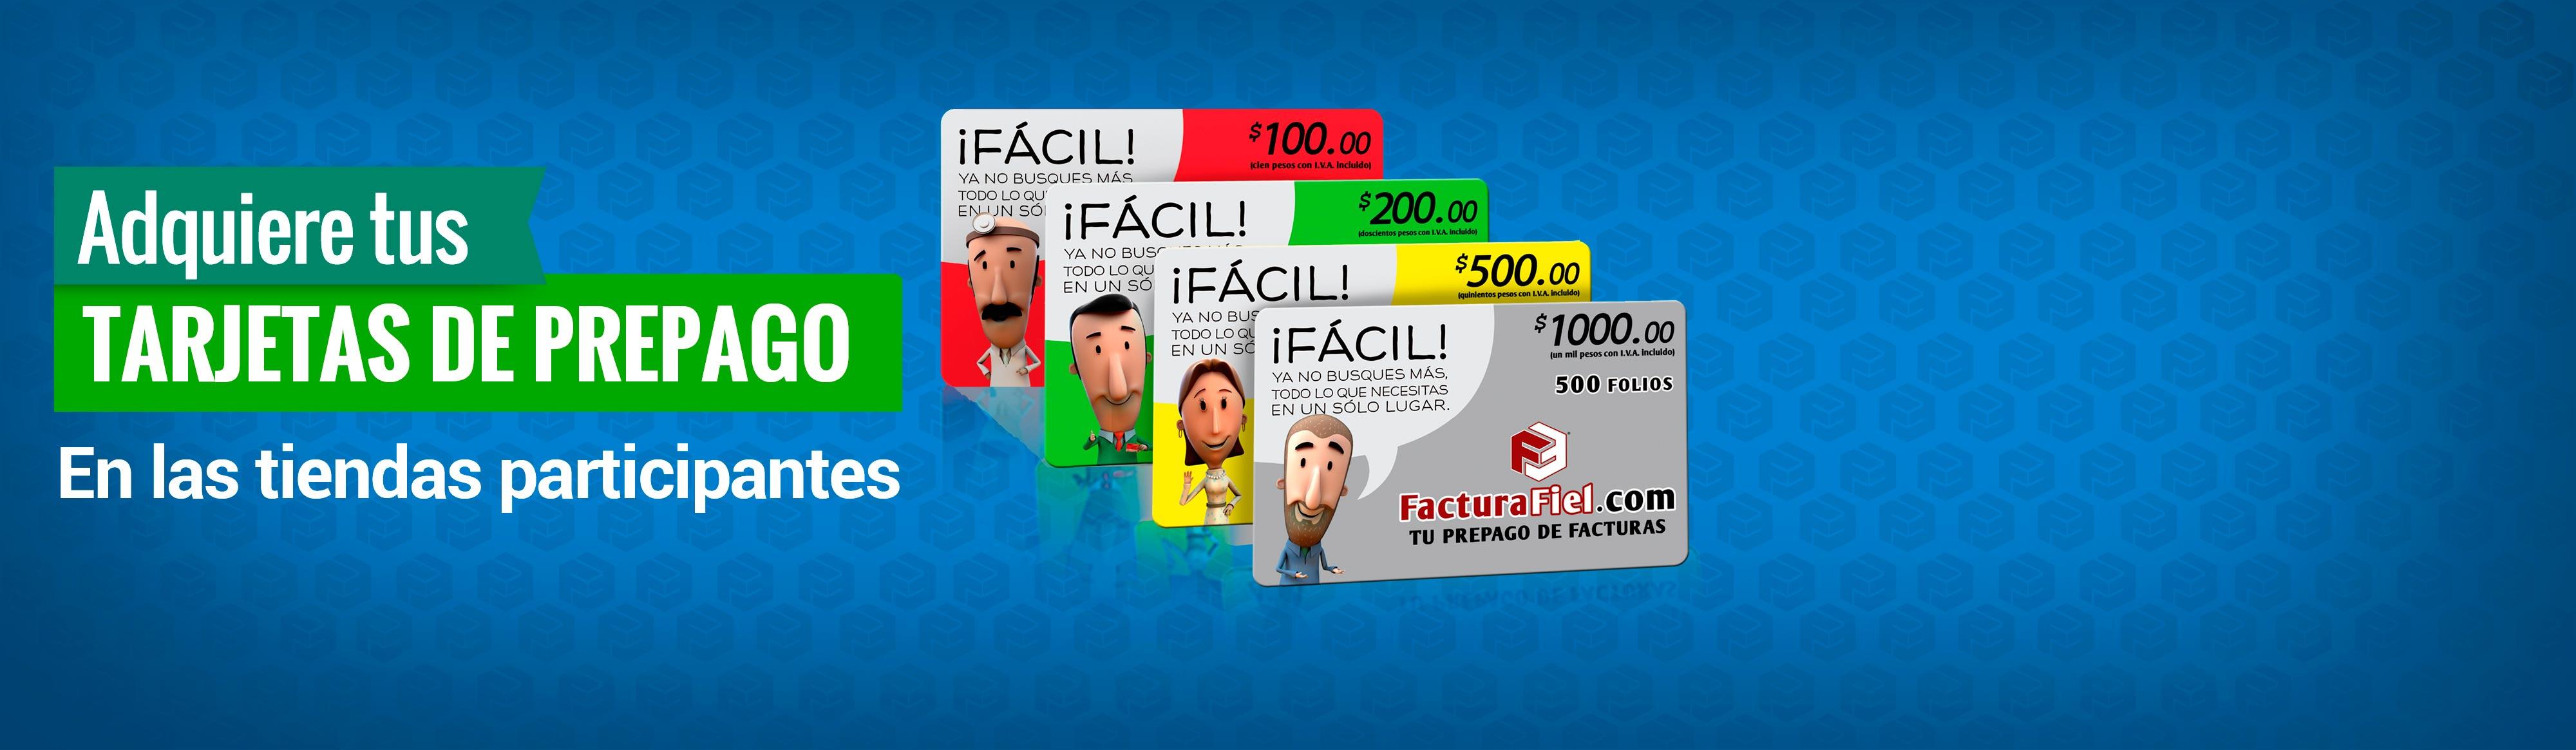 FacturaFiel | Tu Prepago de Facturas